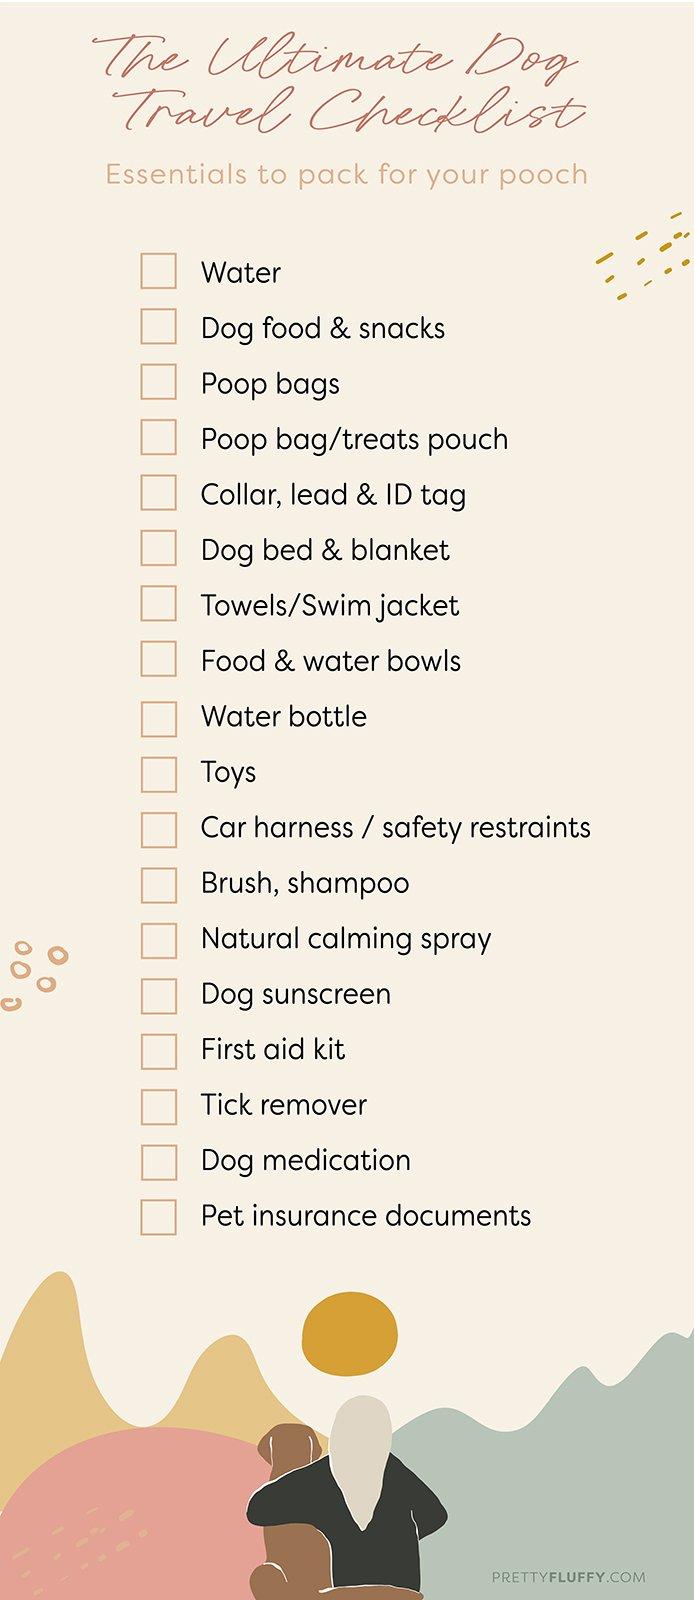 Pretty Fluffy Printable_The Ultimate Dog Travel Checklist